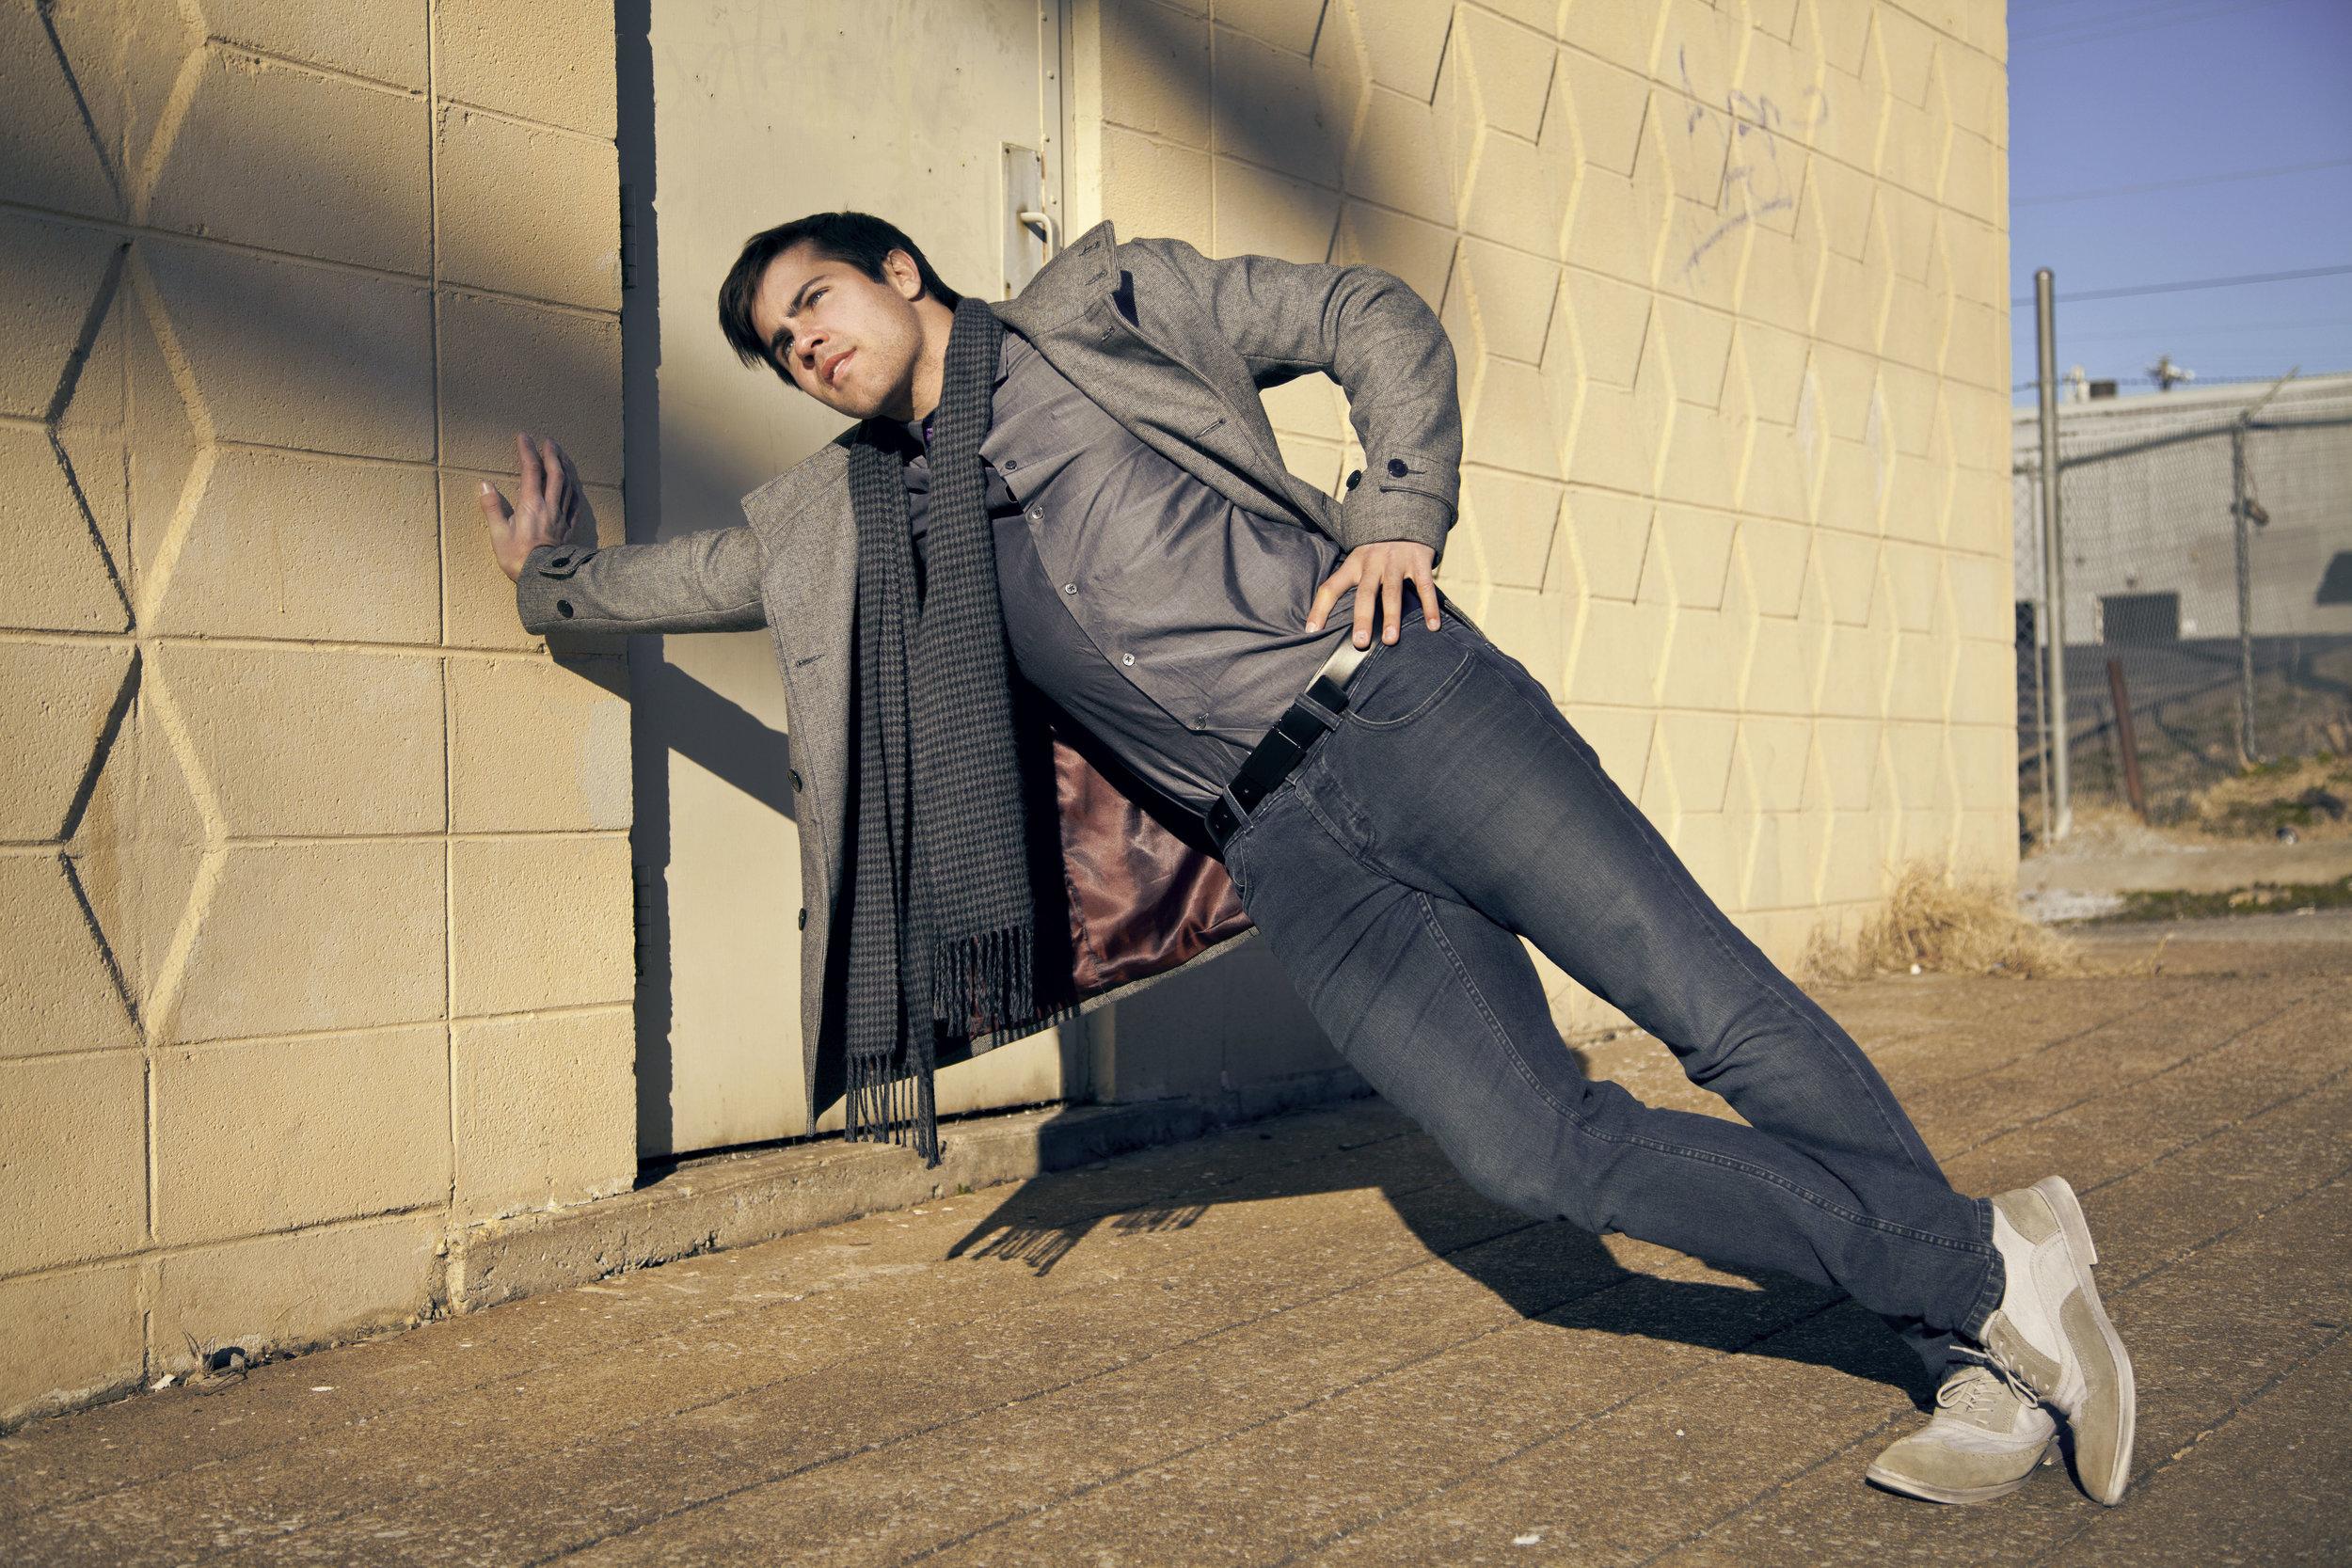 Cameron Gilliam Full Body 2.jpg